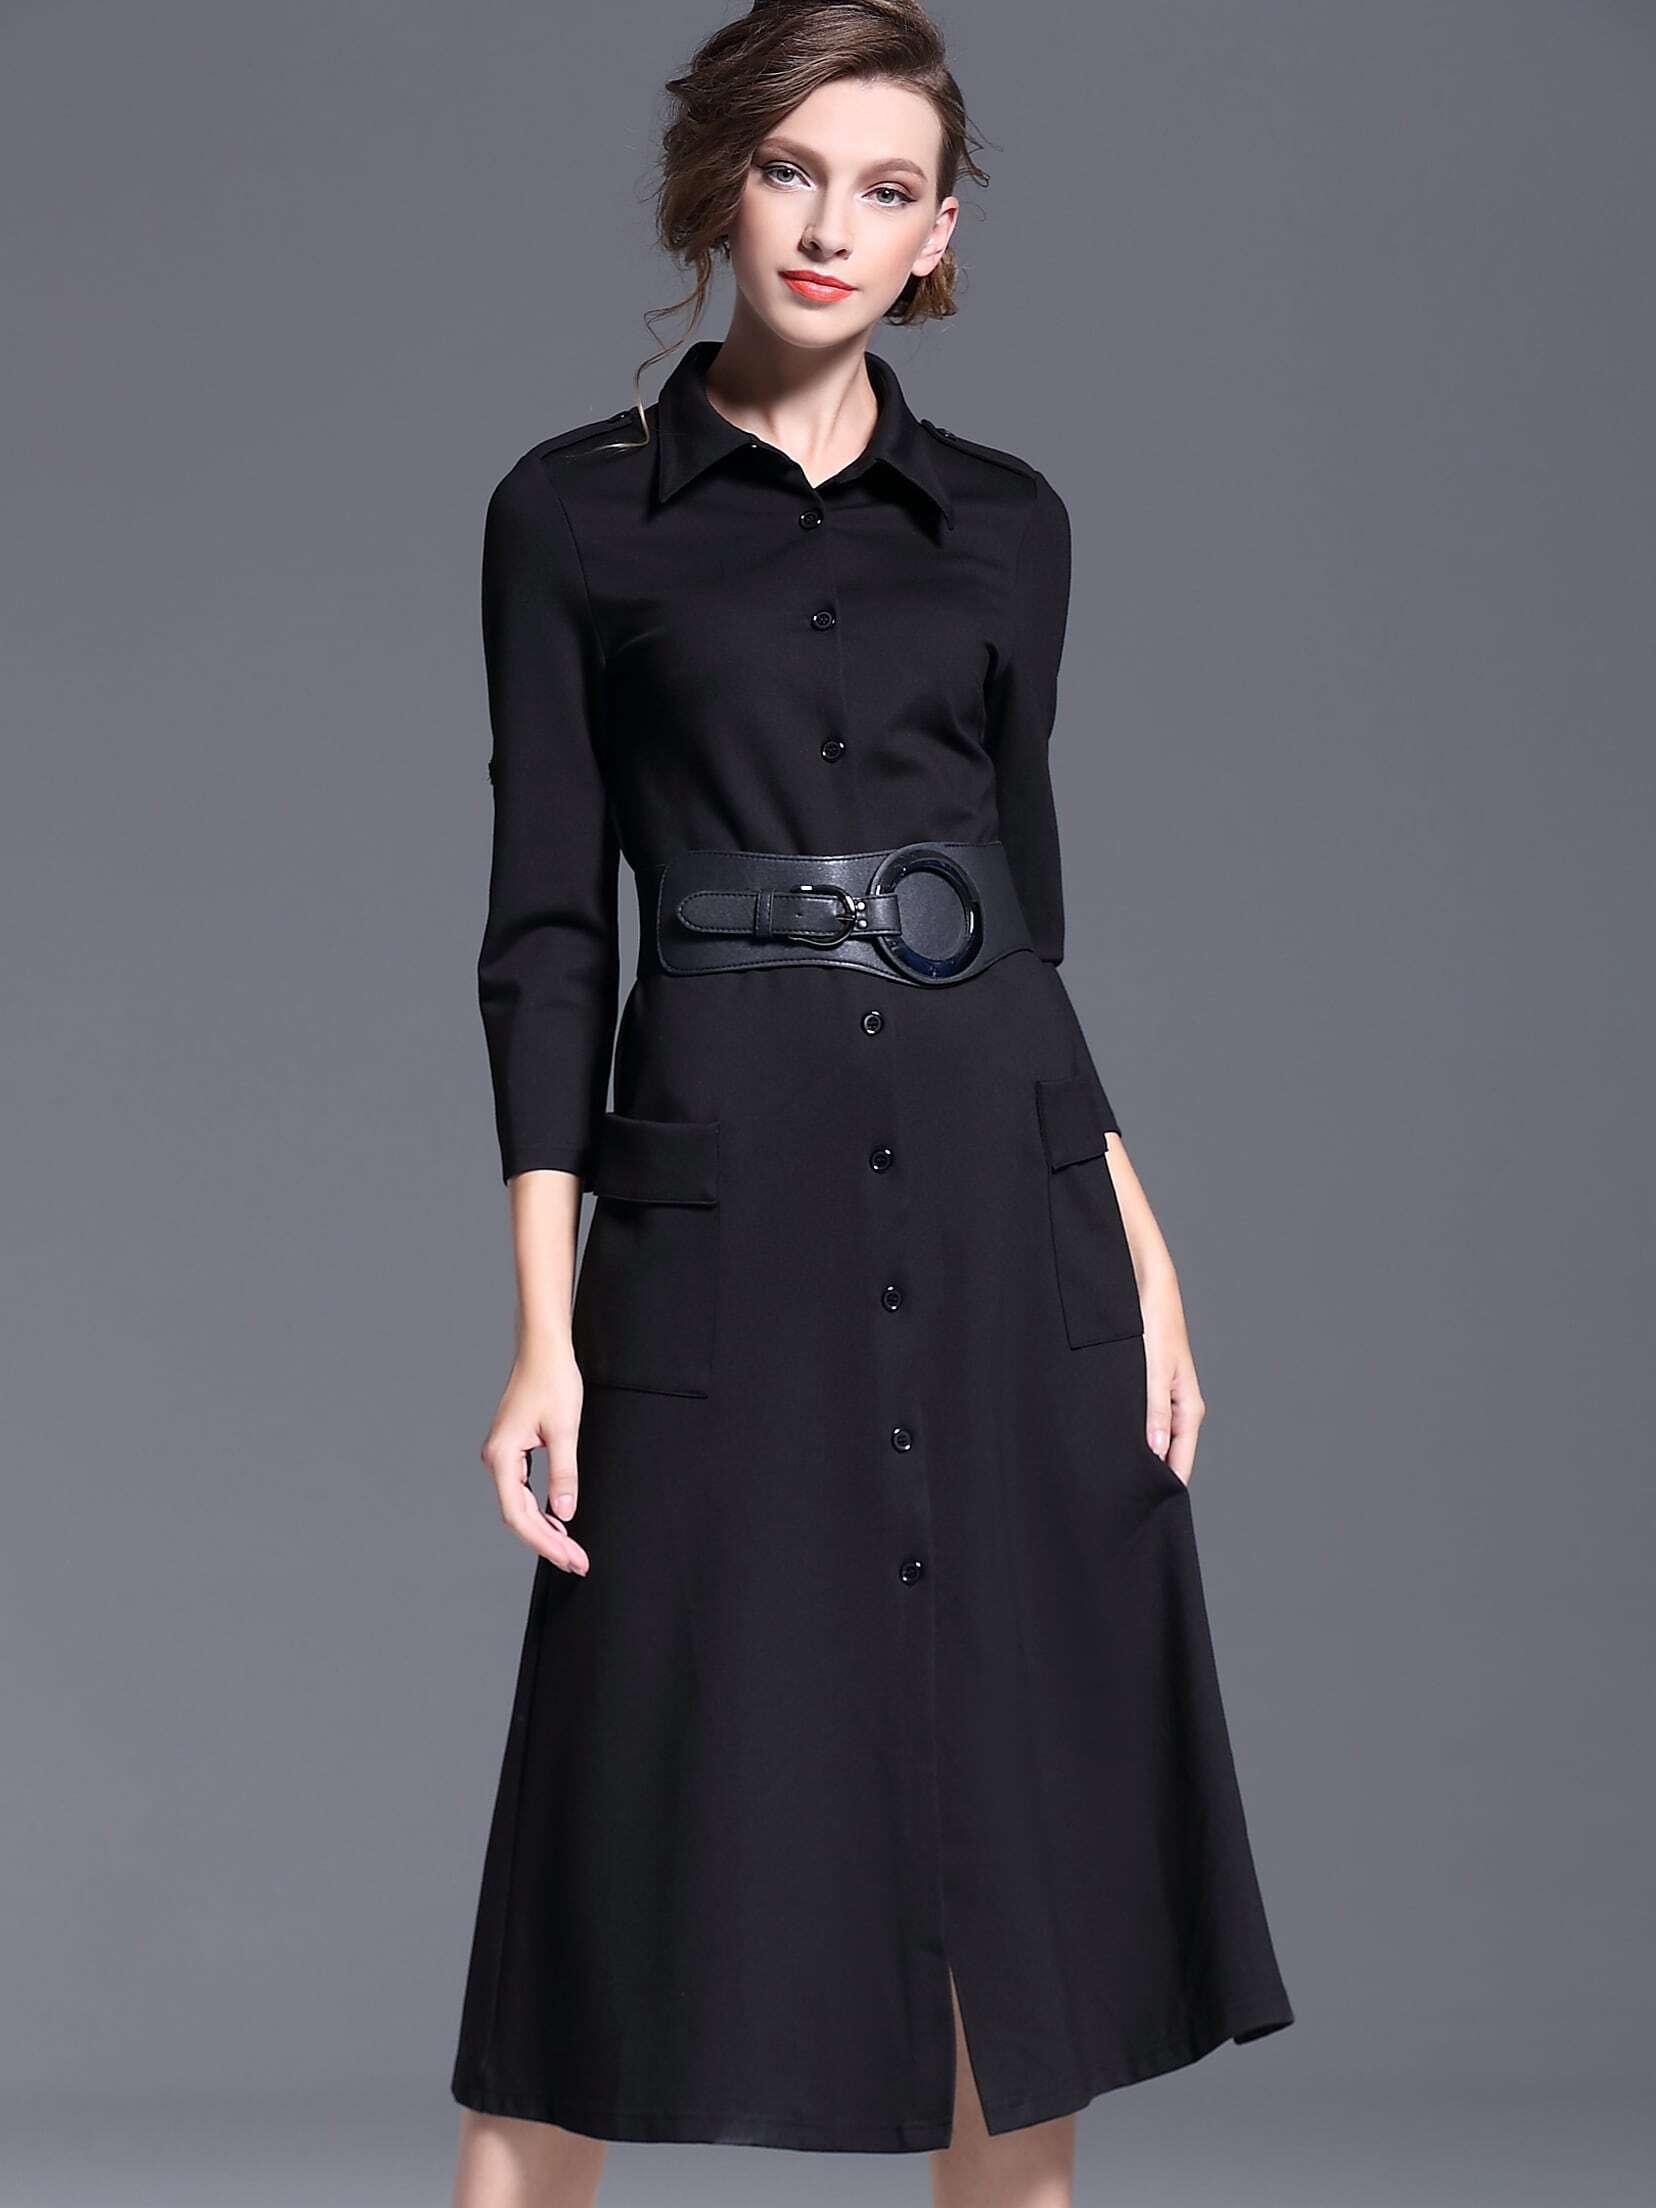 Black Lapel Length Sleeve Drawstring Pockets Dress